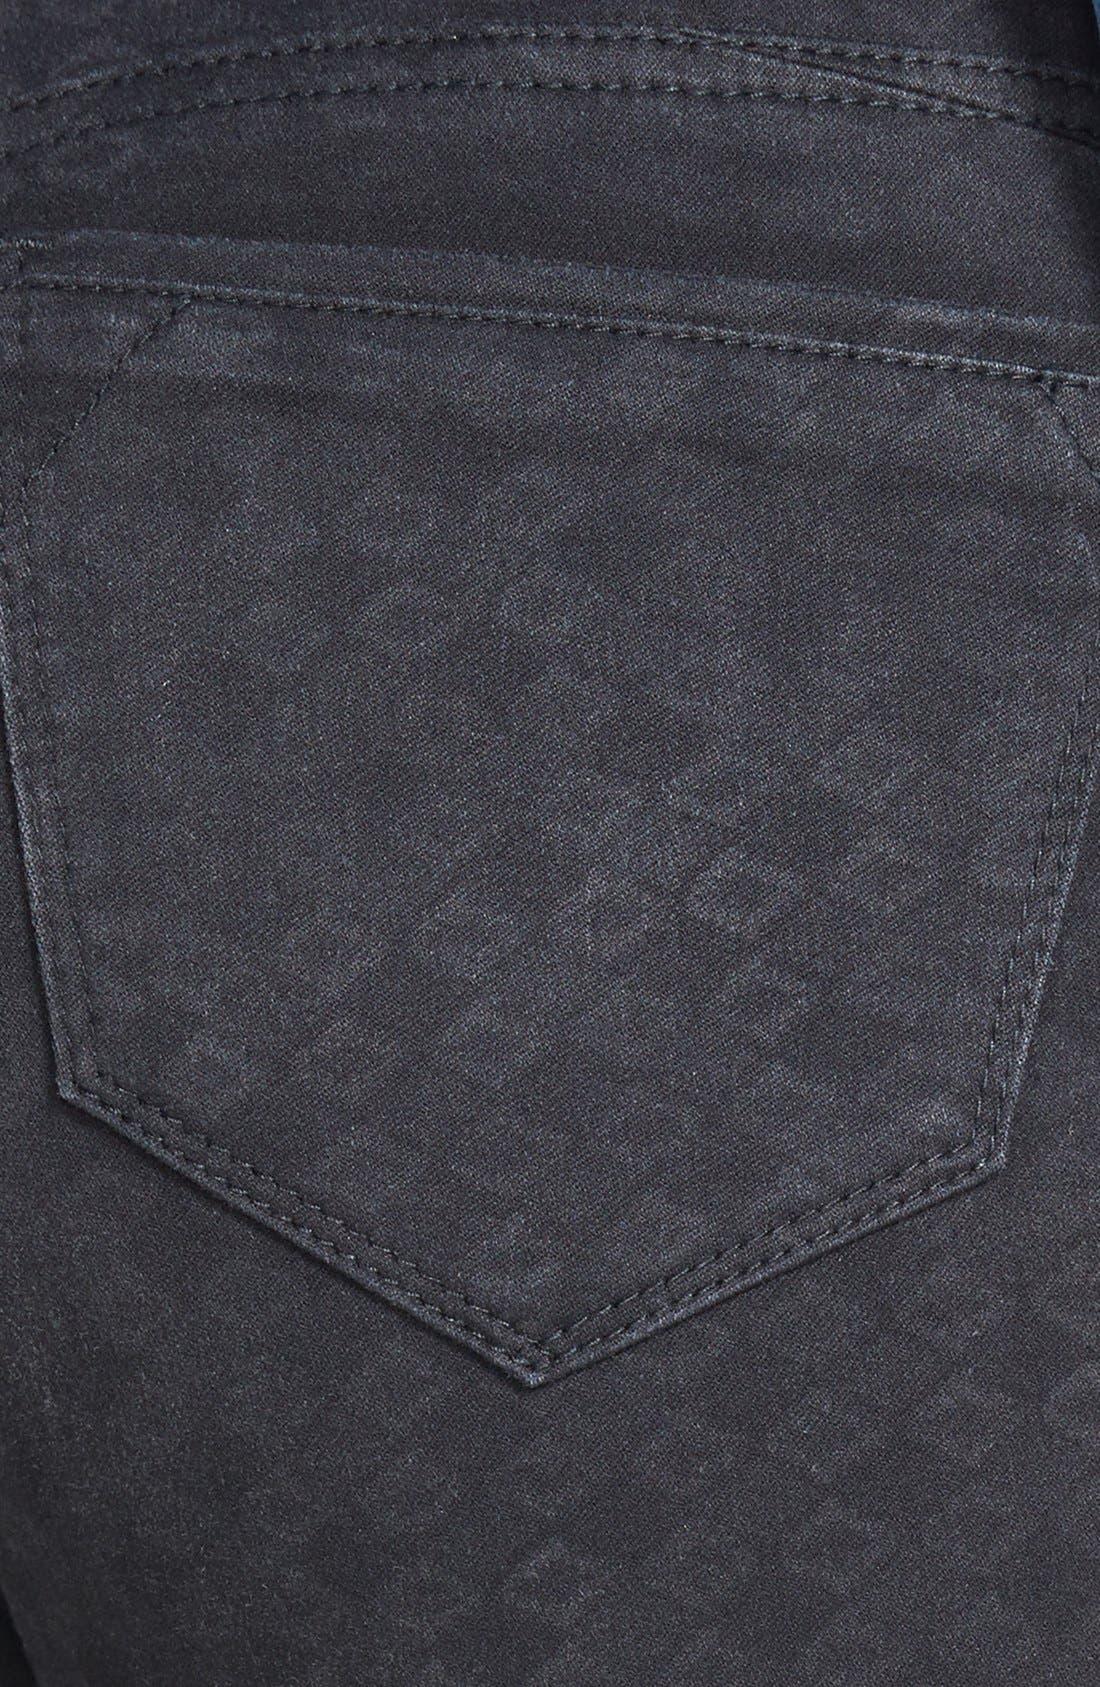 Alternate Image 3  - Wit & Wisdom Diamond Stencil Skinny Jeans (Black) (Nordstrom Exclusive)